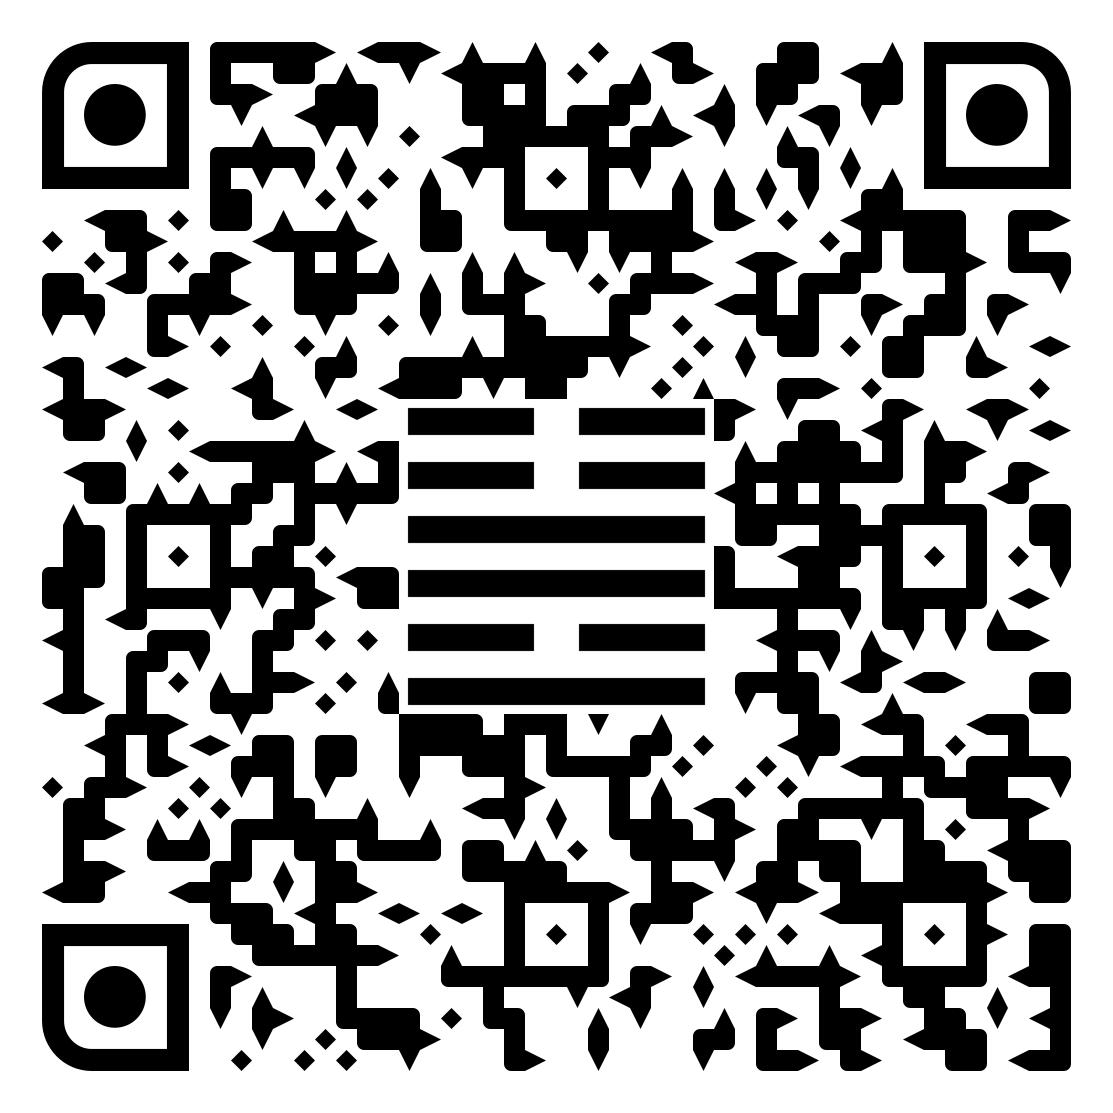 qr-code-55.png